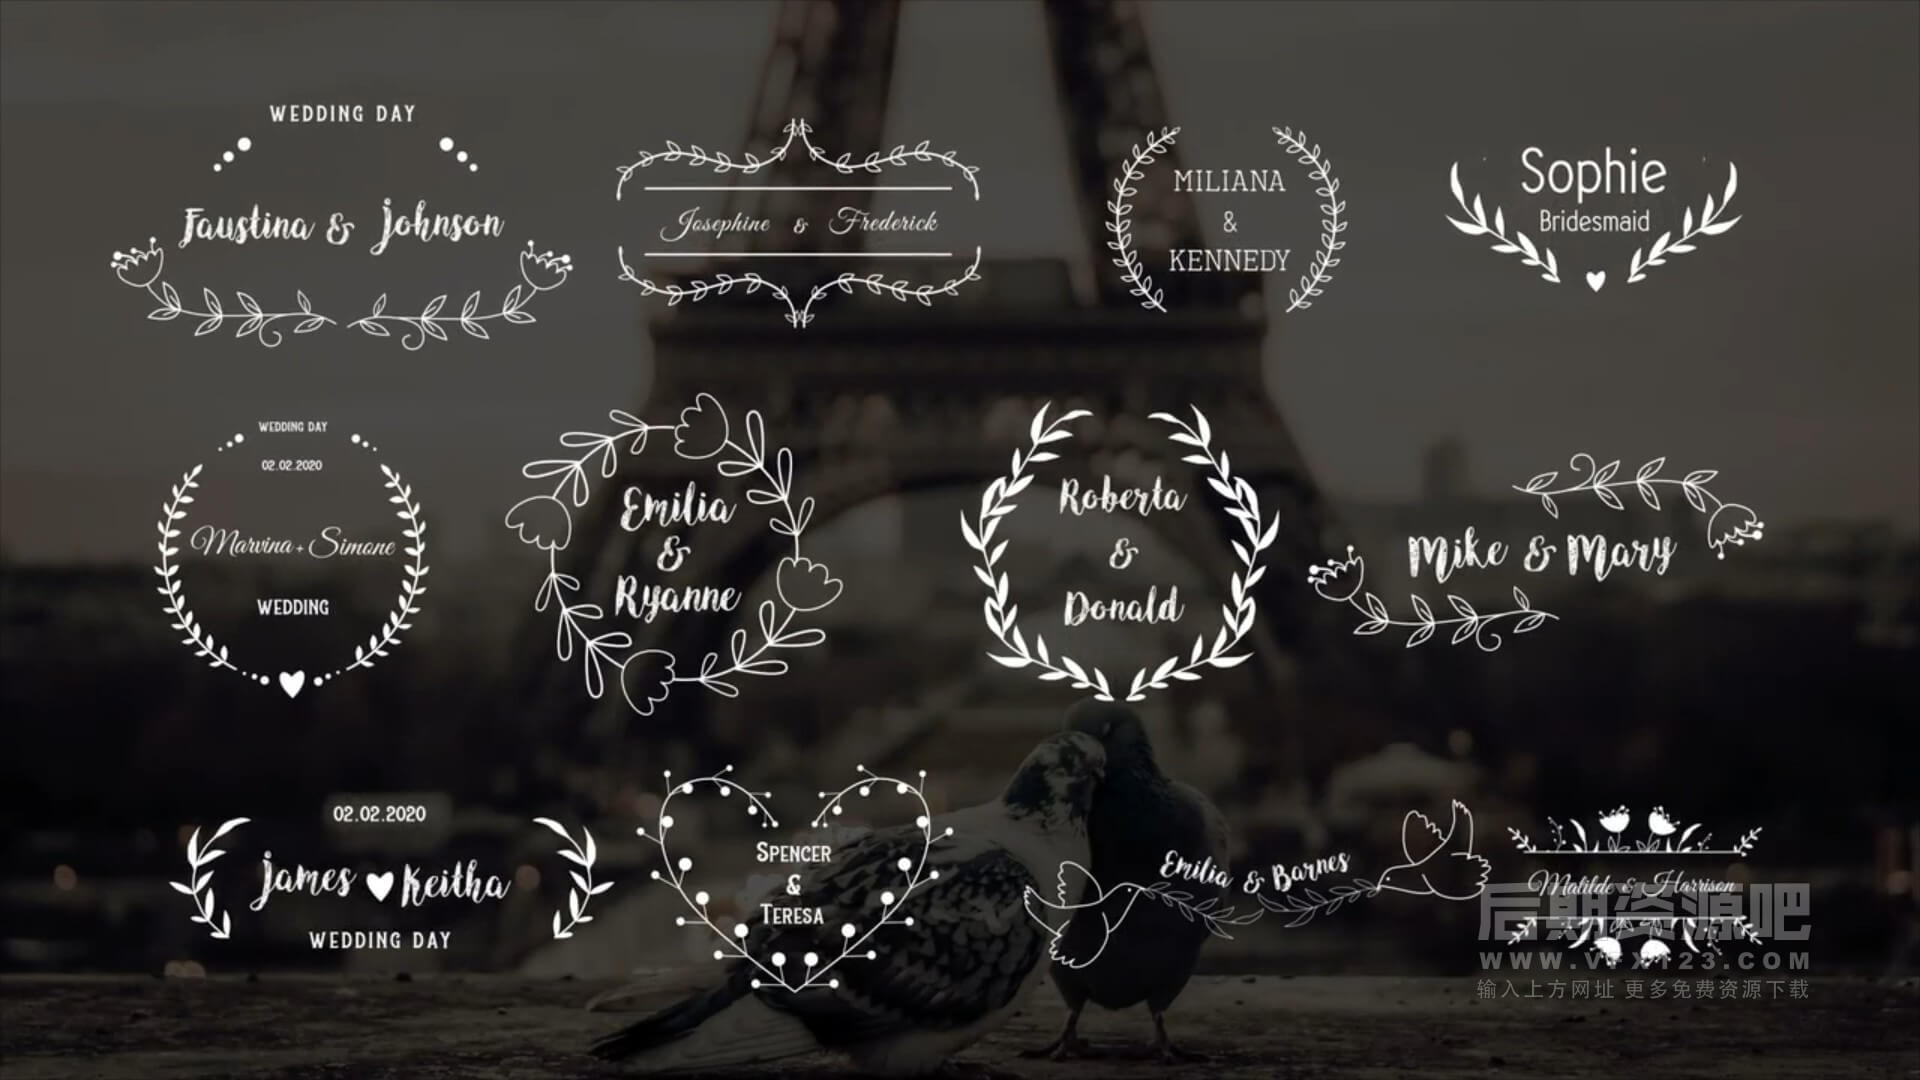 fcpx插件 12组花纹边框婚礼人名婚期标题动画模板 Elegant Wedding Titles